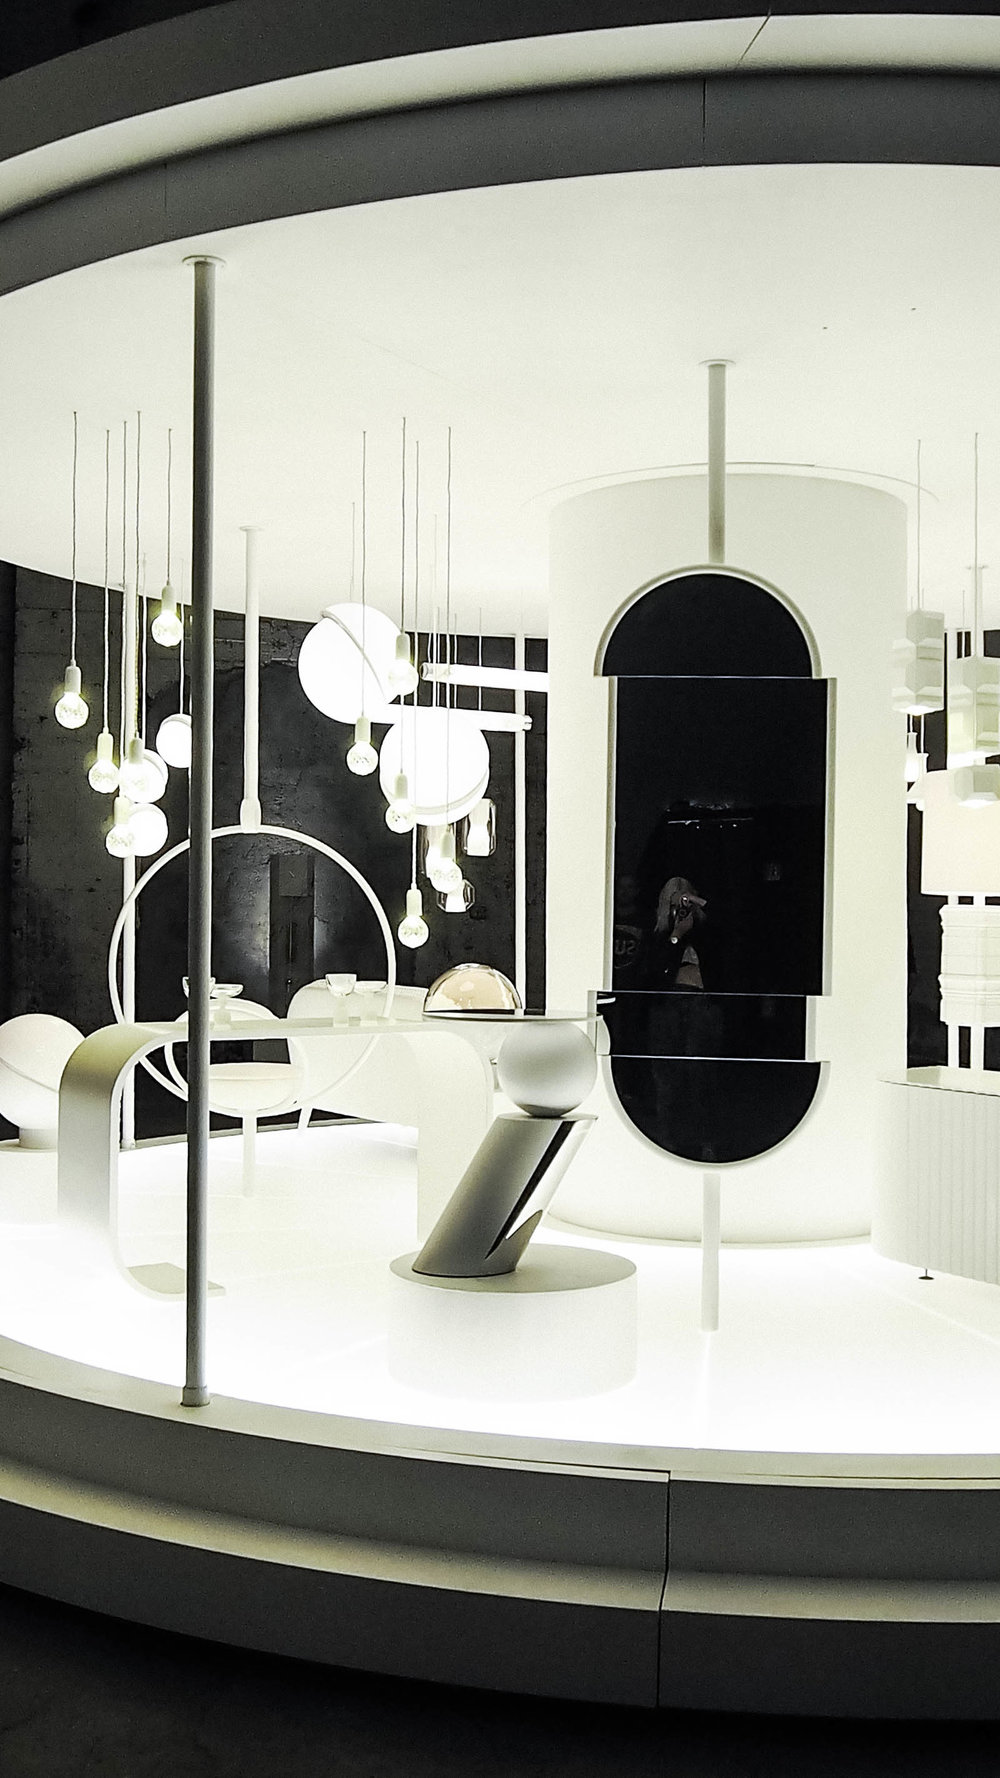 A Look At Lee Broomu0027s Installation At Milan Design Week 2017.